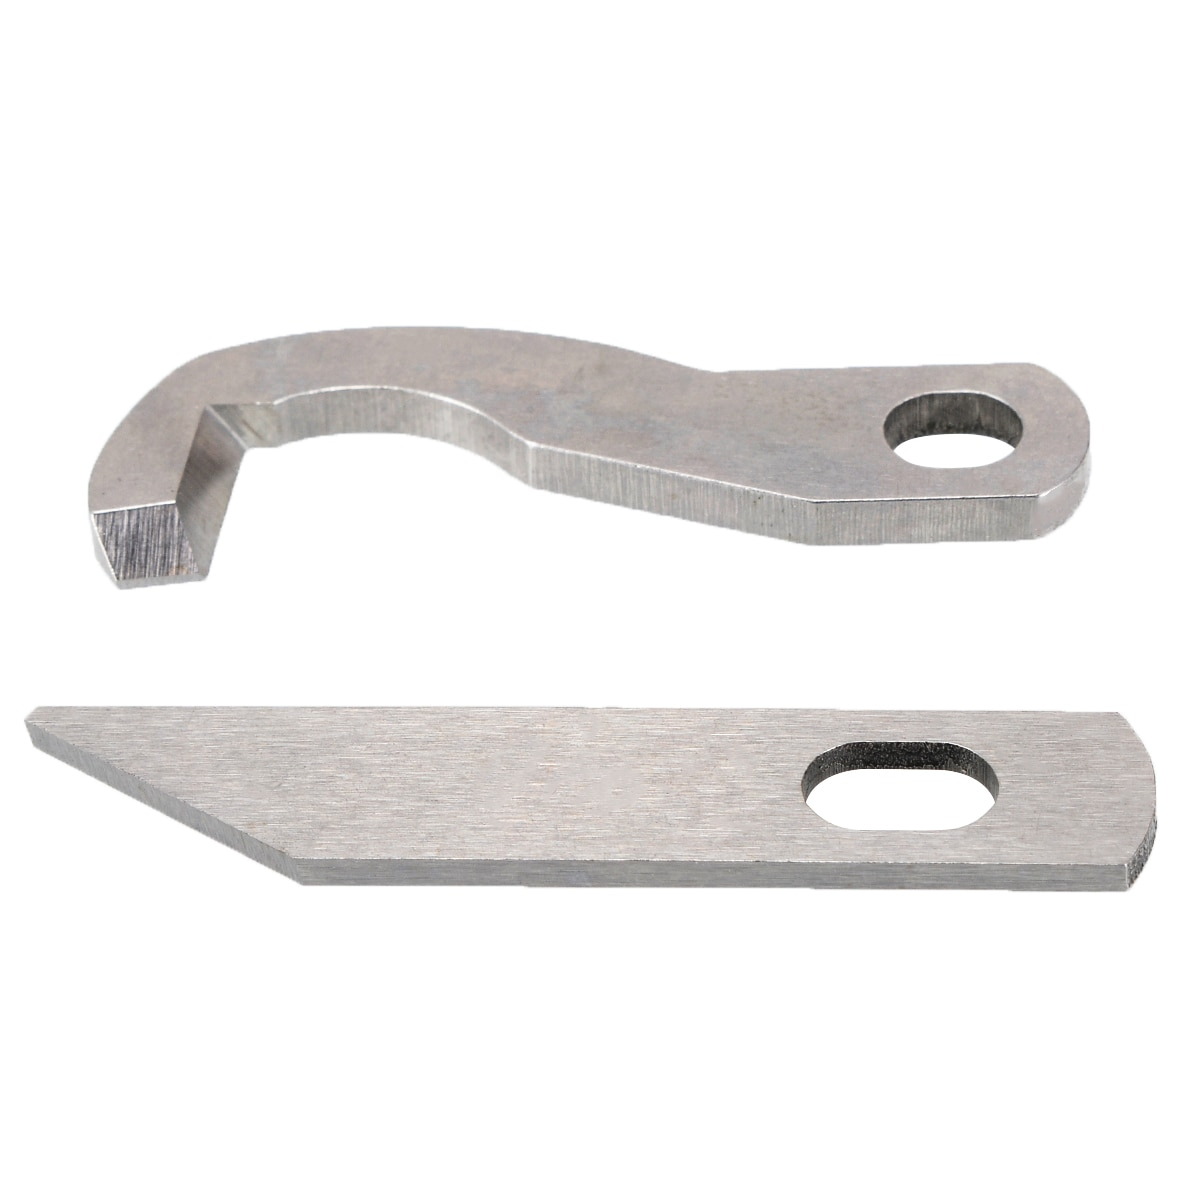 2 unids/set Metal Overlock superior y inferior cortador para hermano 929D 1034D XB0563001 X77683001 DE COSER hoja de la máquina